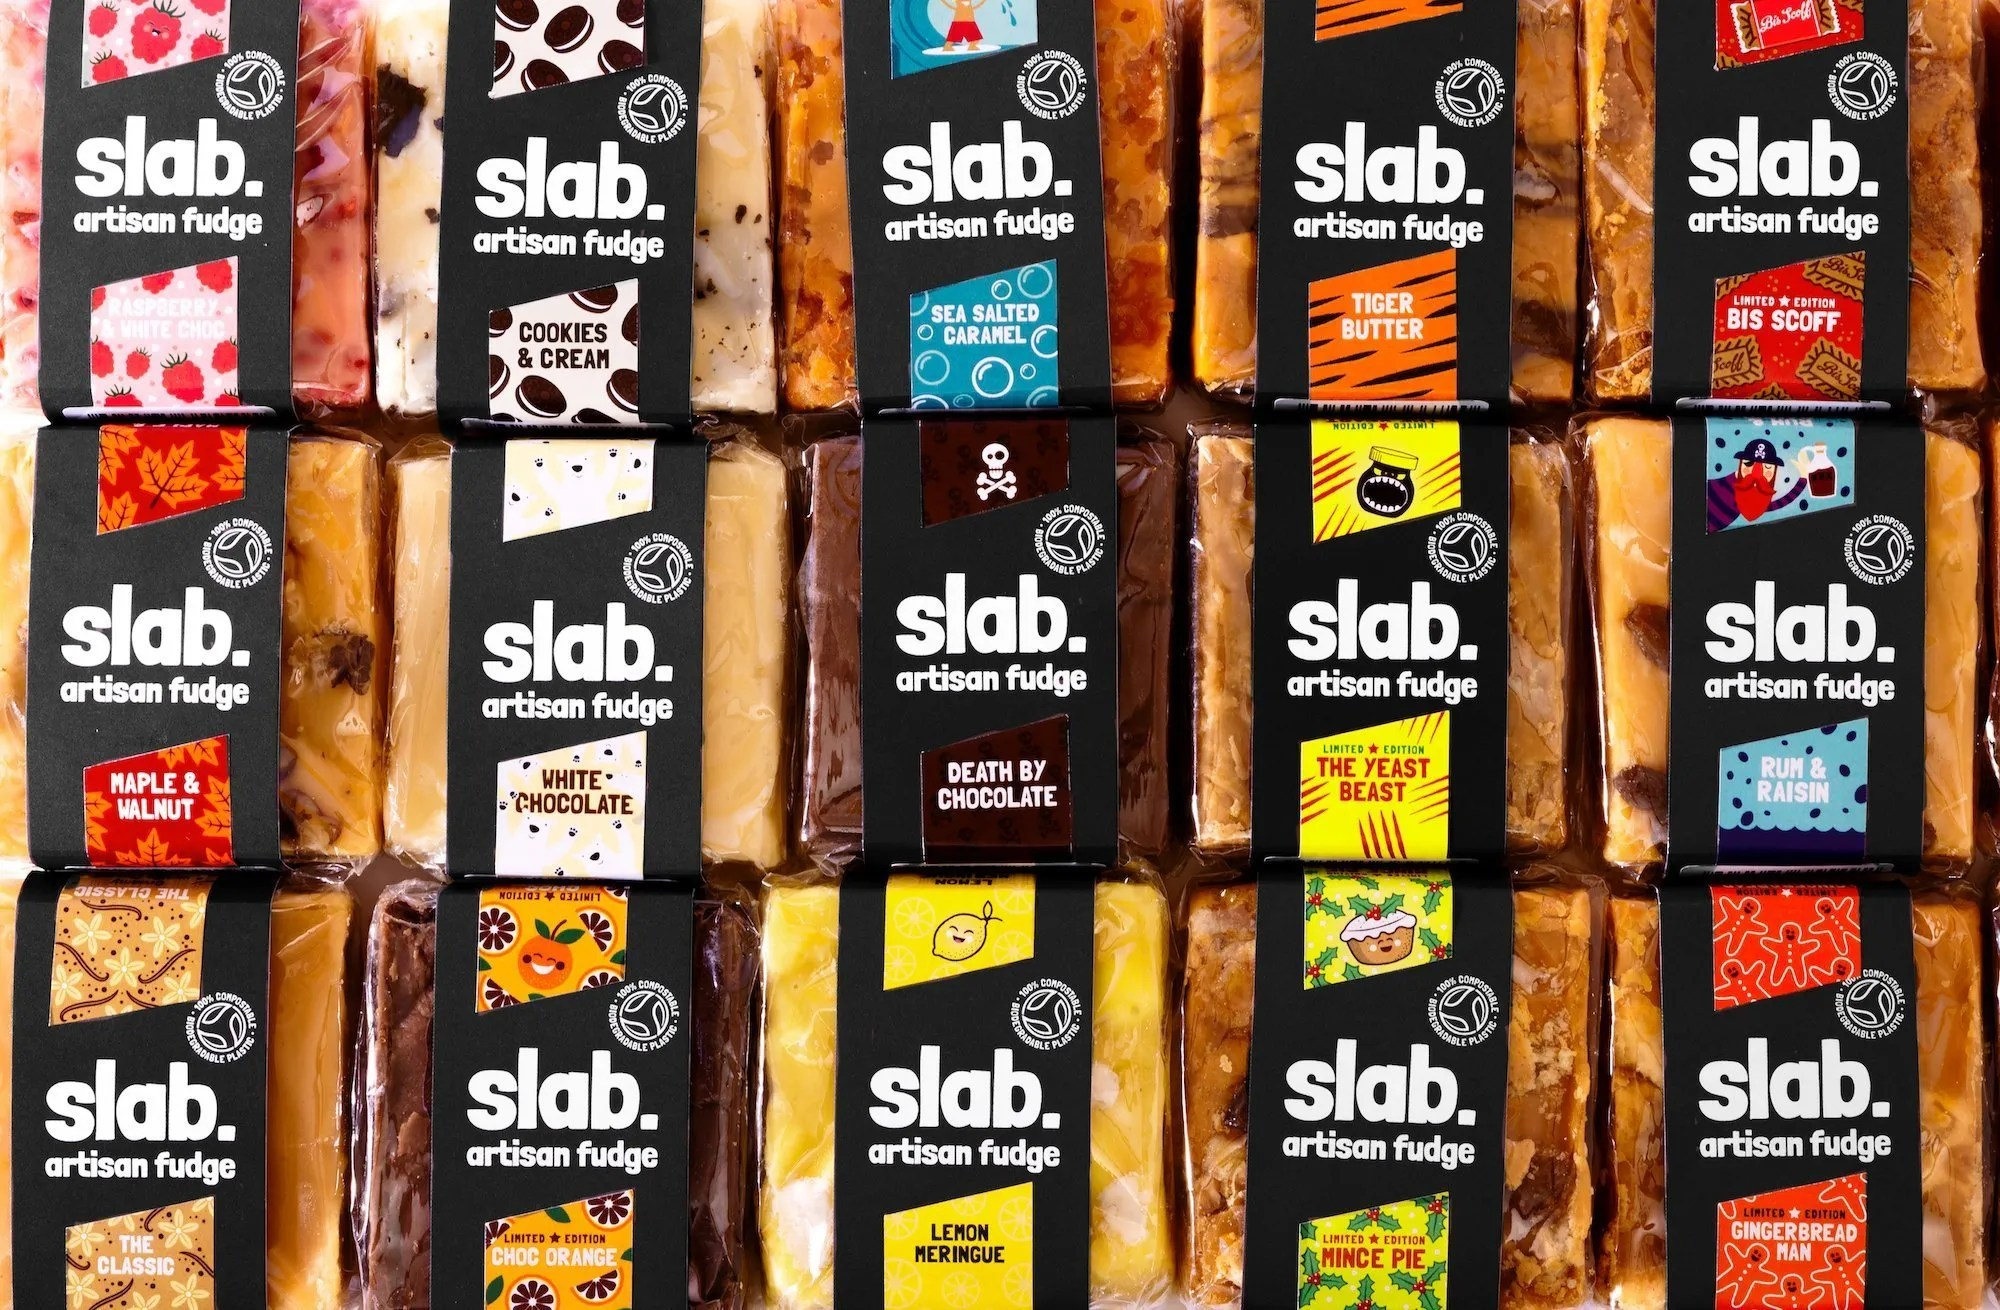 Slab Dairy Fudge - Image Compare